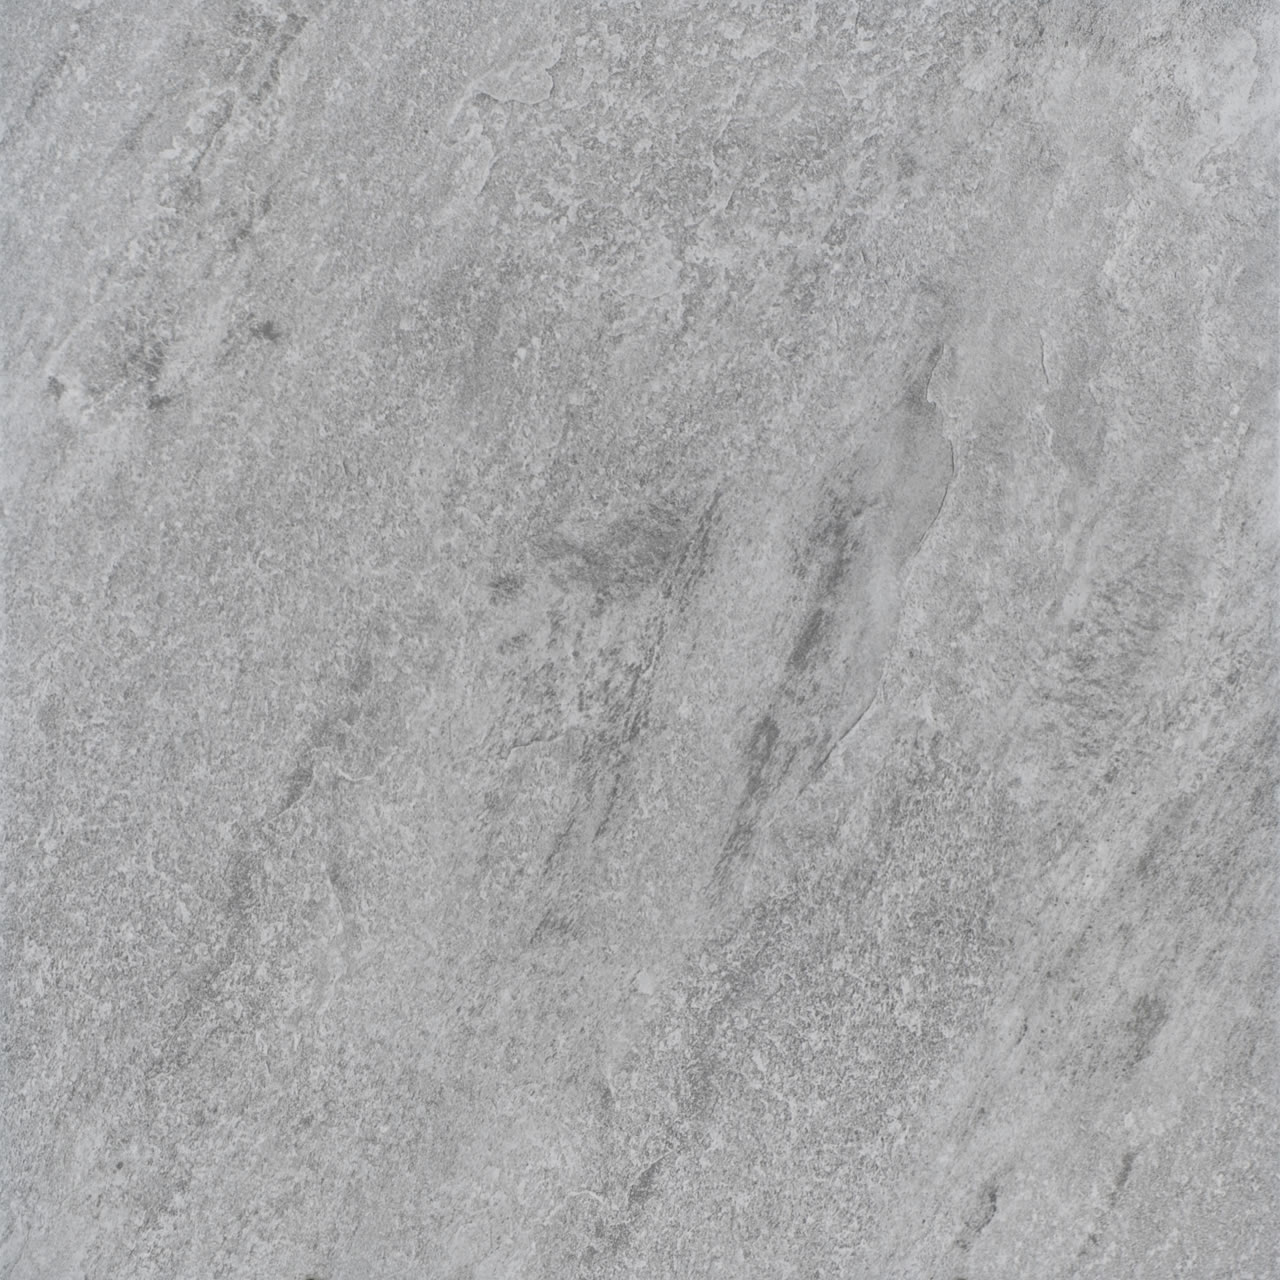 bahia gray stone ext